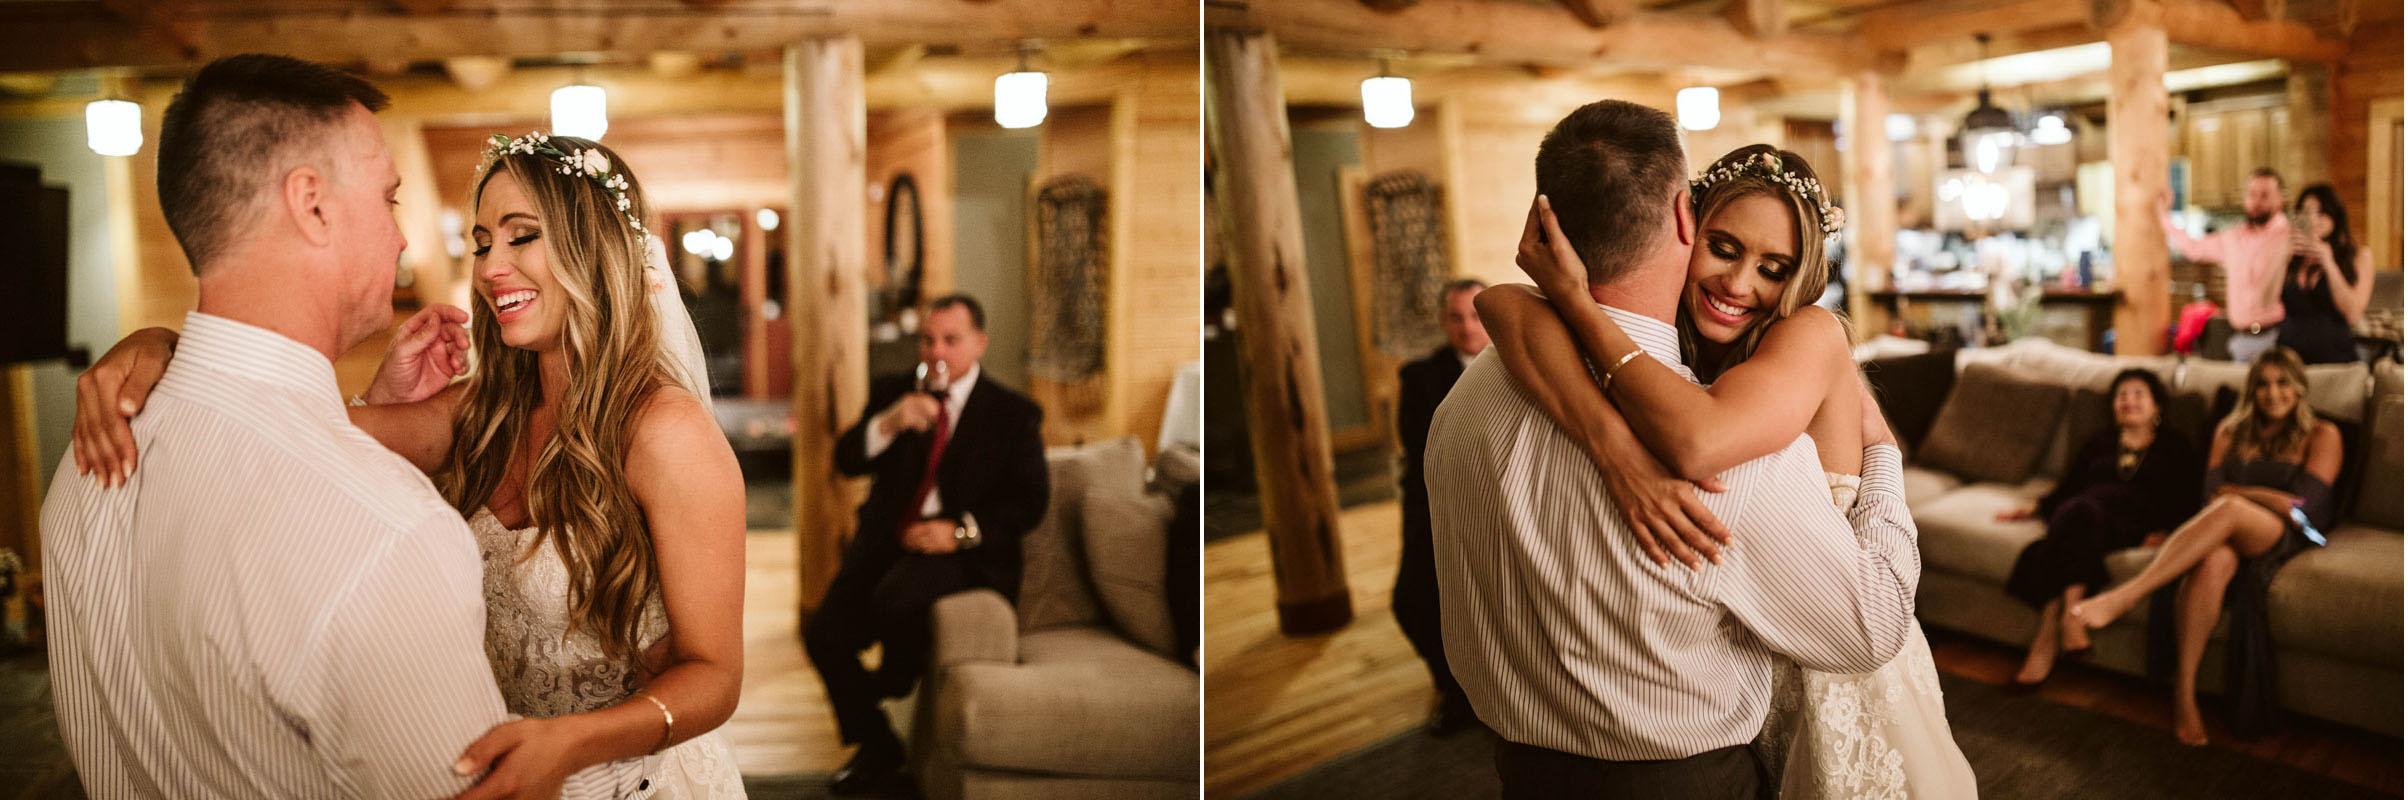 intimate-elopment-blue-ridge-georgia-north-georgia-wedding-photographers (87).jpg